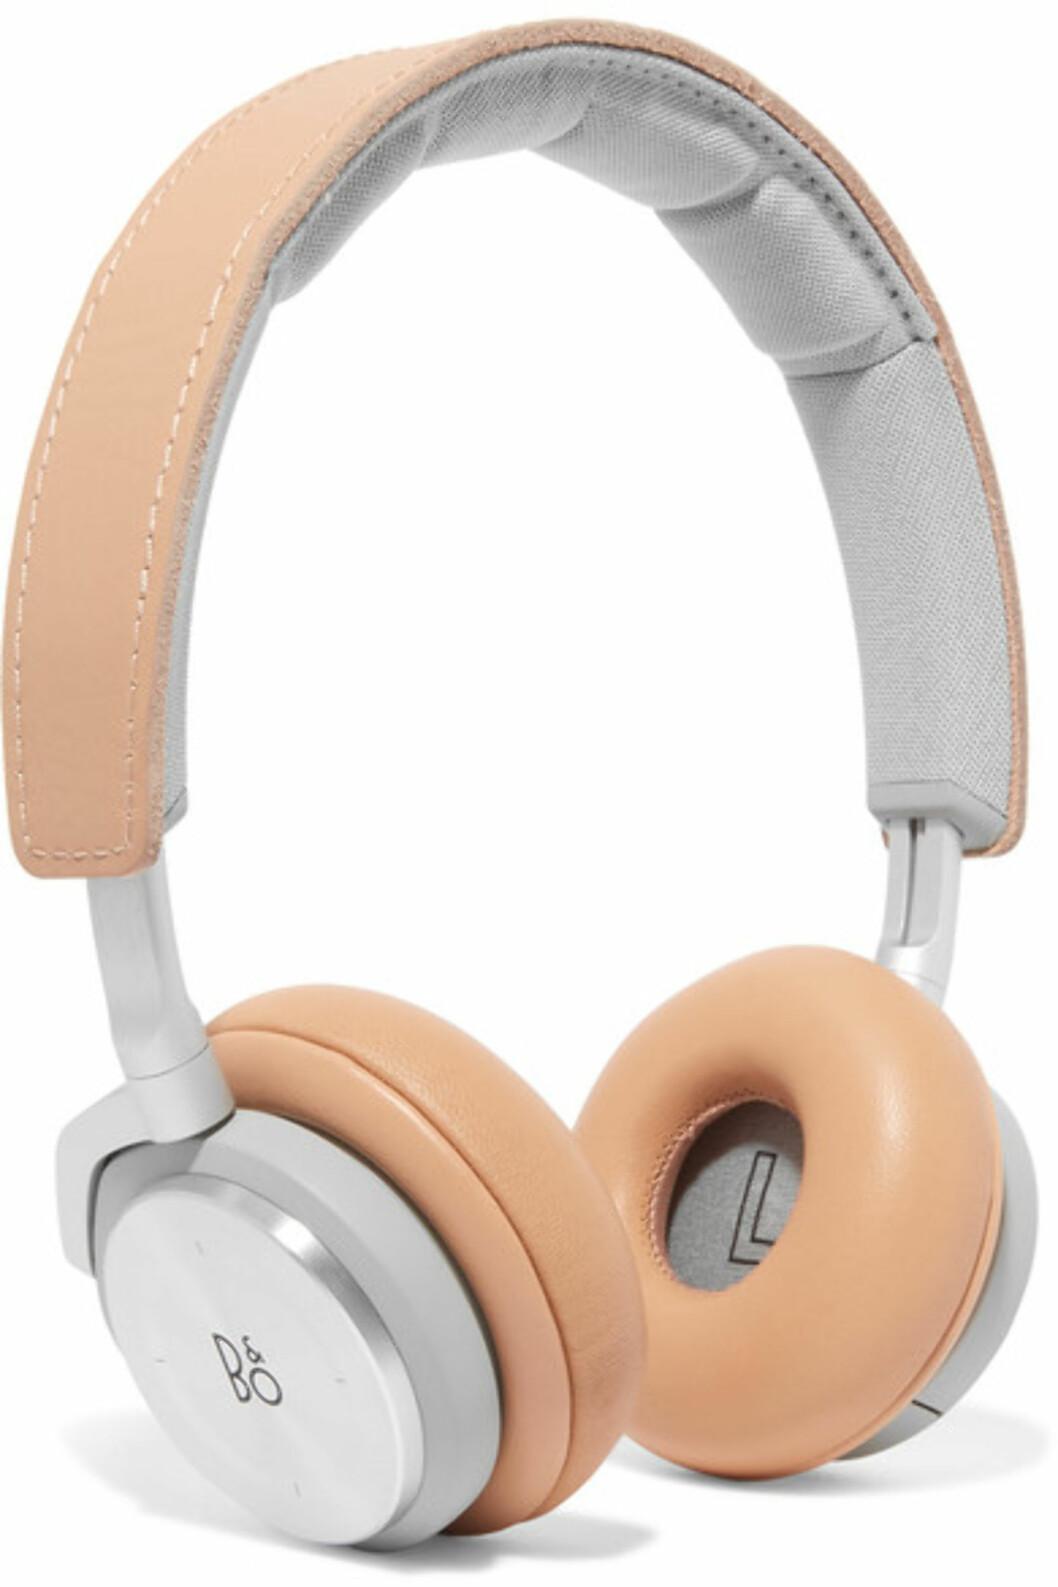 Headset fra B&O Play via Net-a-porter.com   kr 6995   https://www.net-a-porter.com/no/en/product/827238/b_o_play/h8-leather-and-silver-tone-headphones